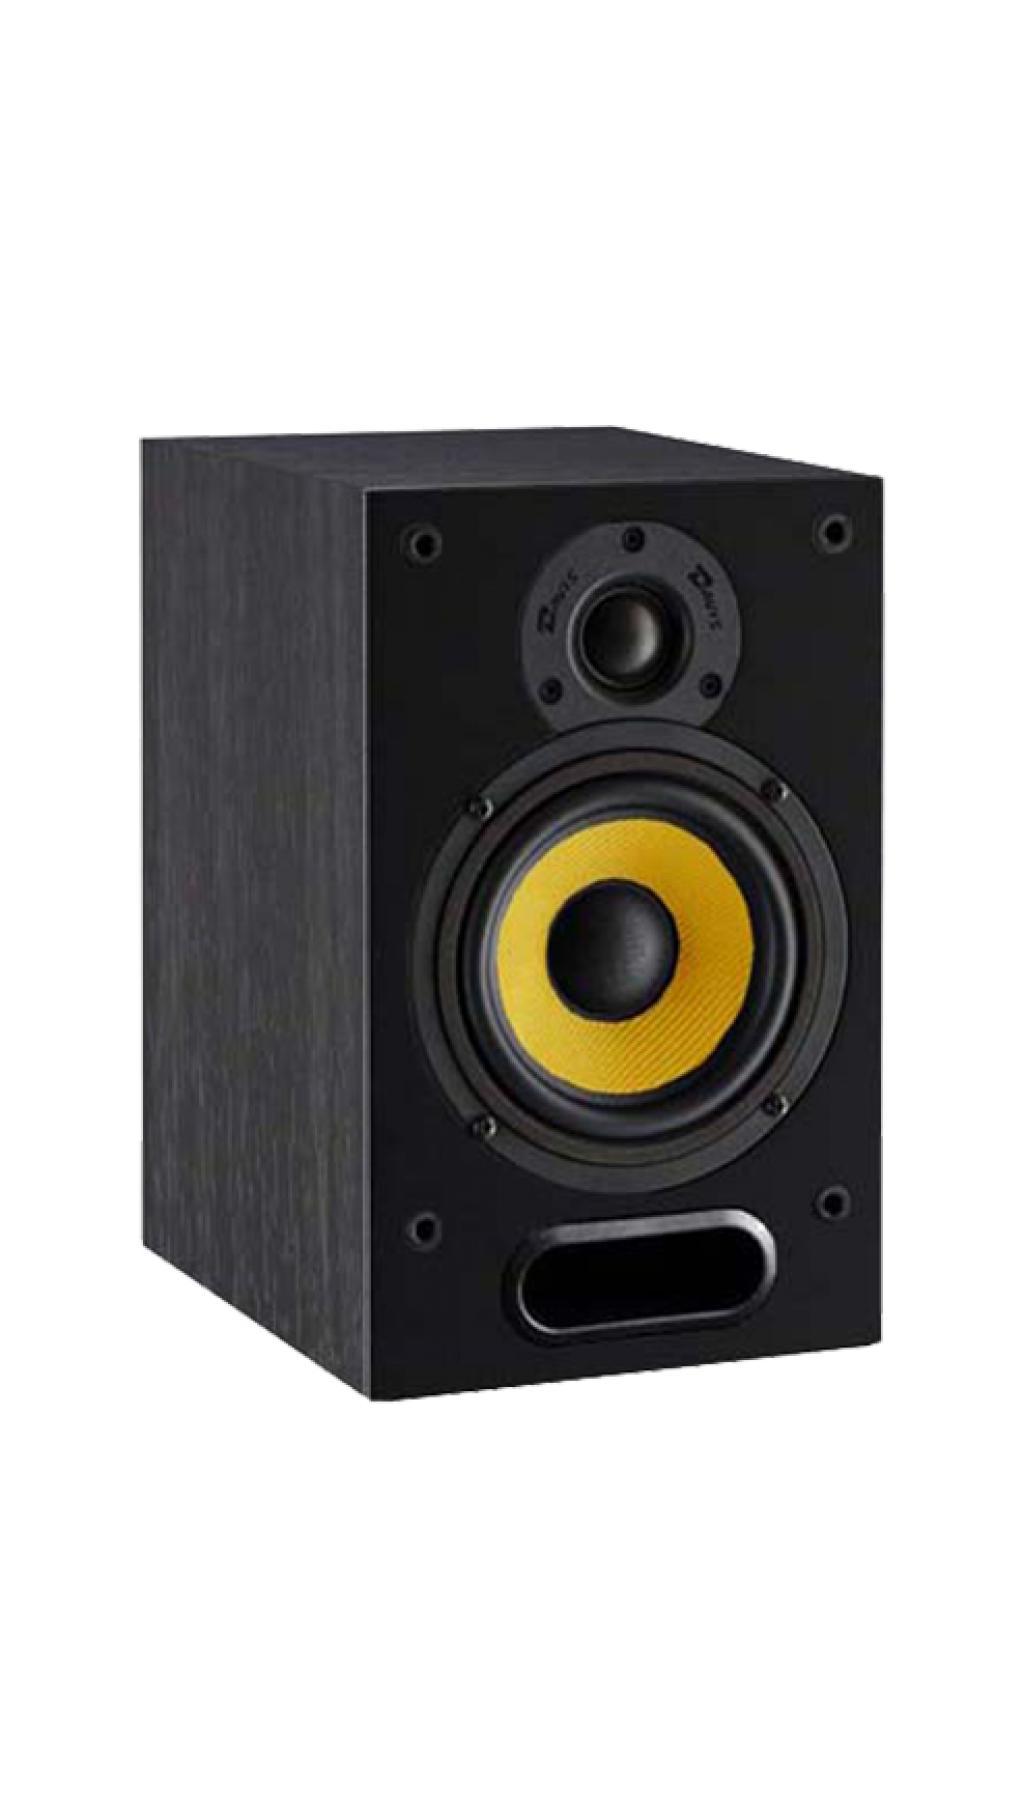 Boxe Davis Acoustics Mia 20 Negru